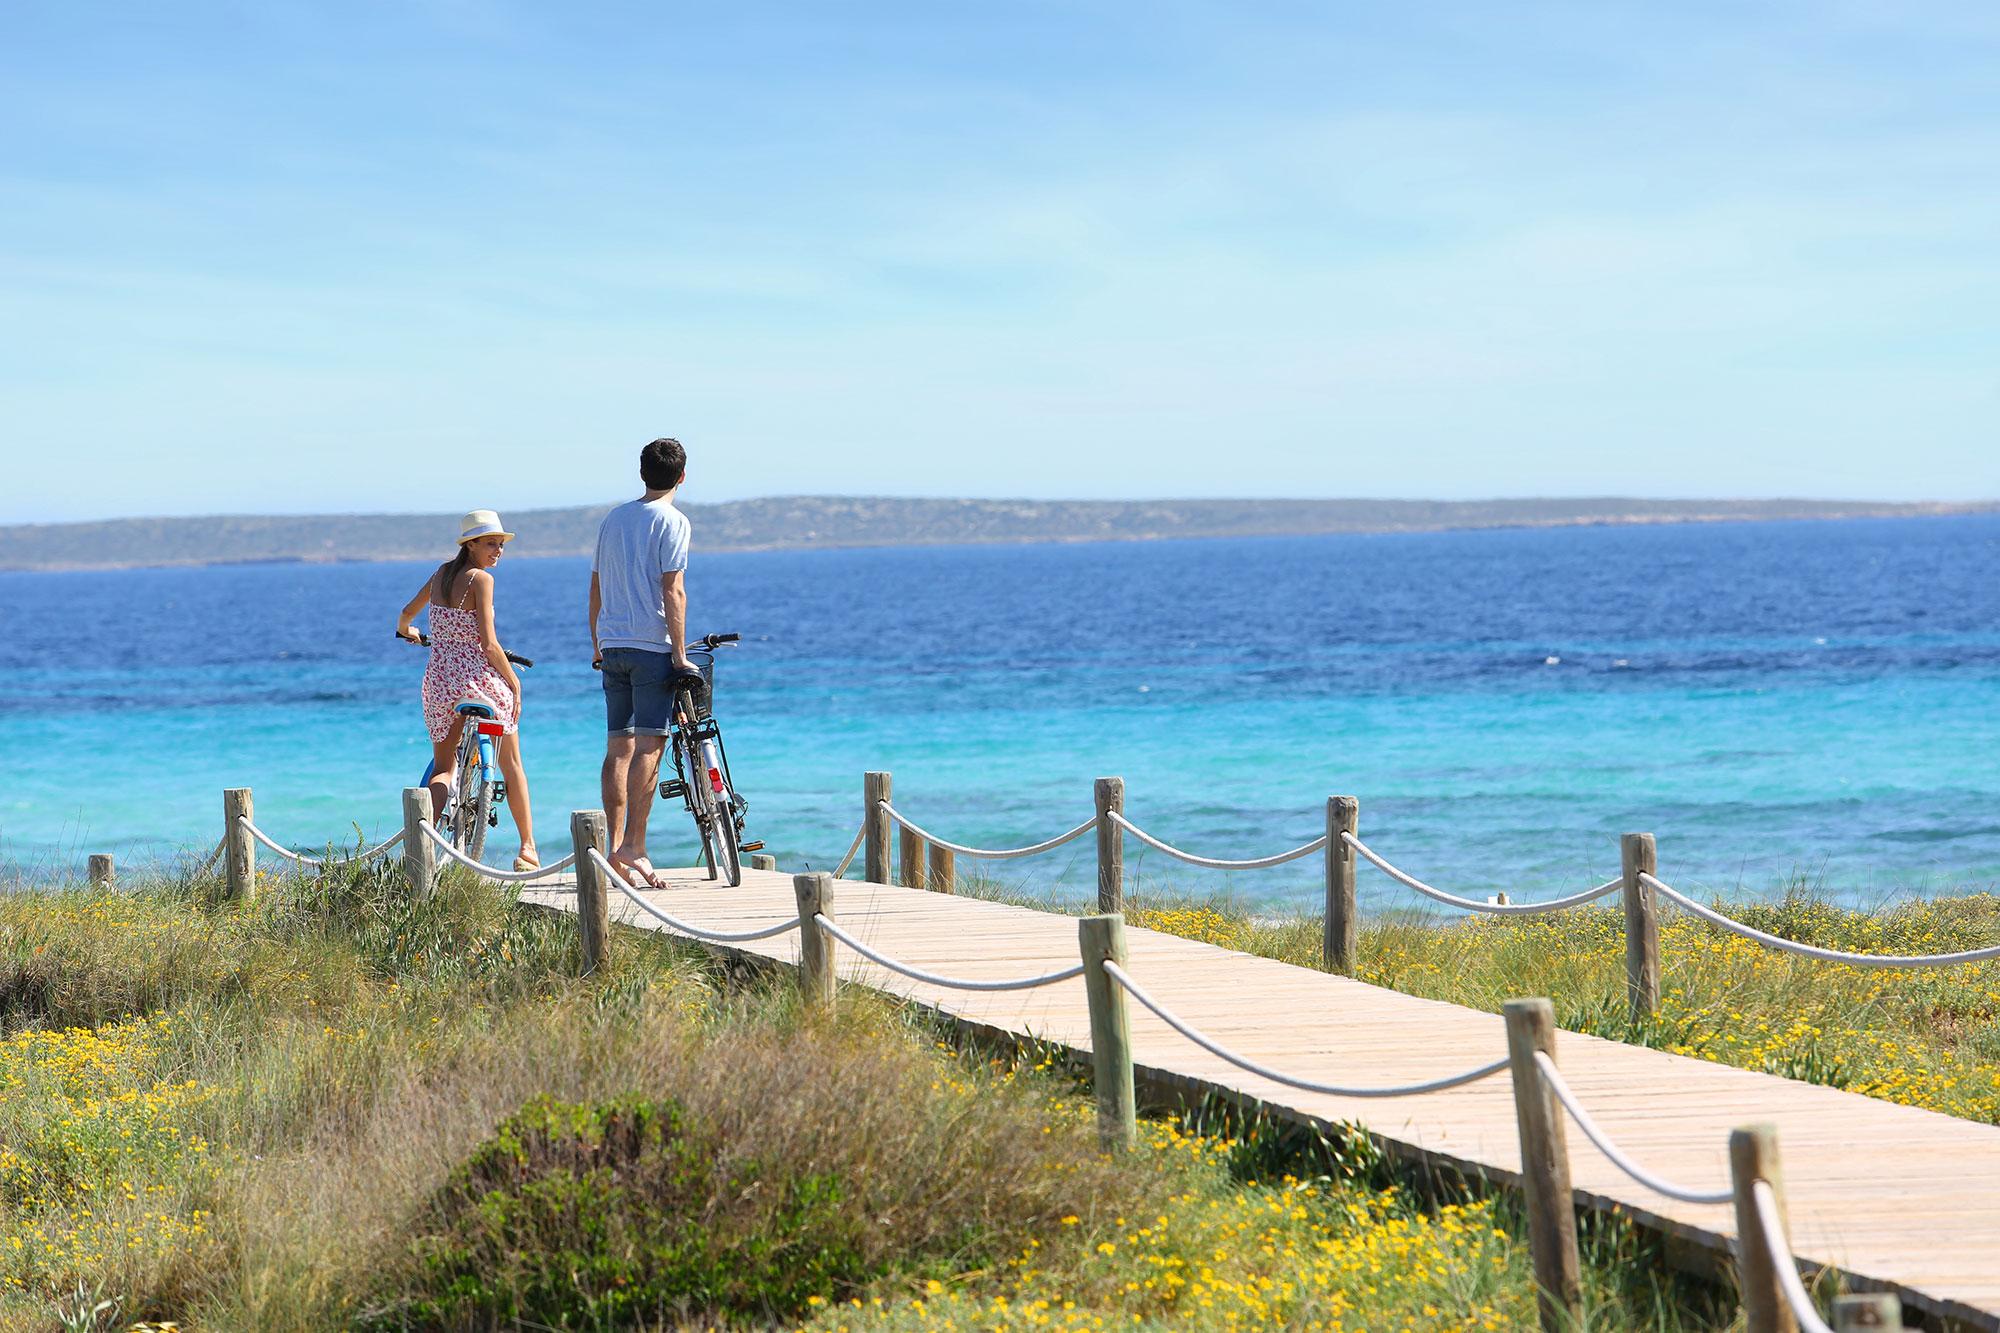 Formentera, una isla para descubrir al ritmo de la bici. Foto: Shutterstock.